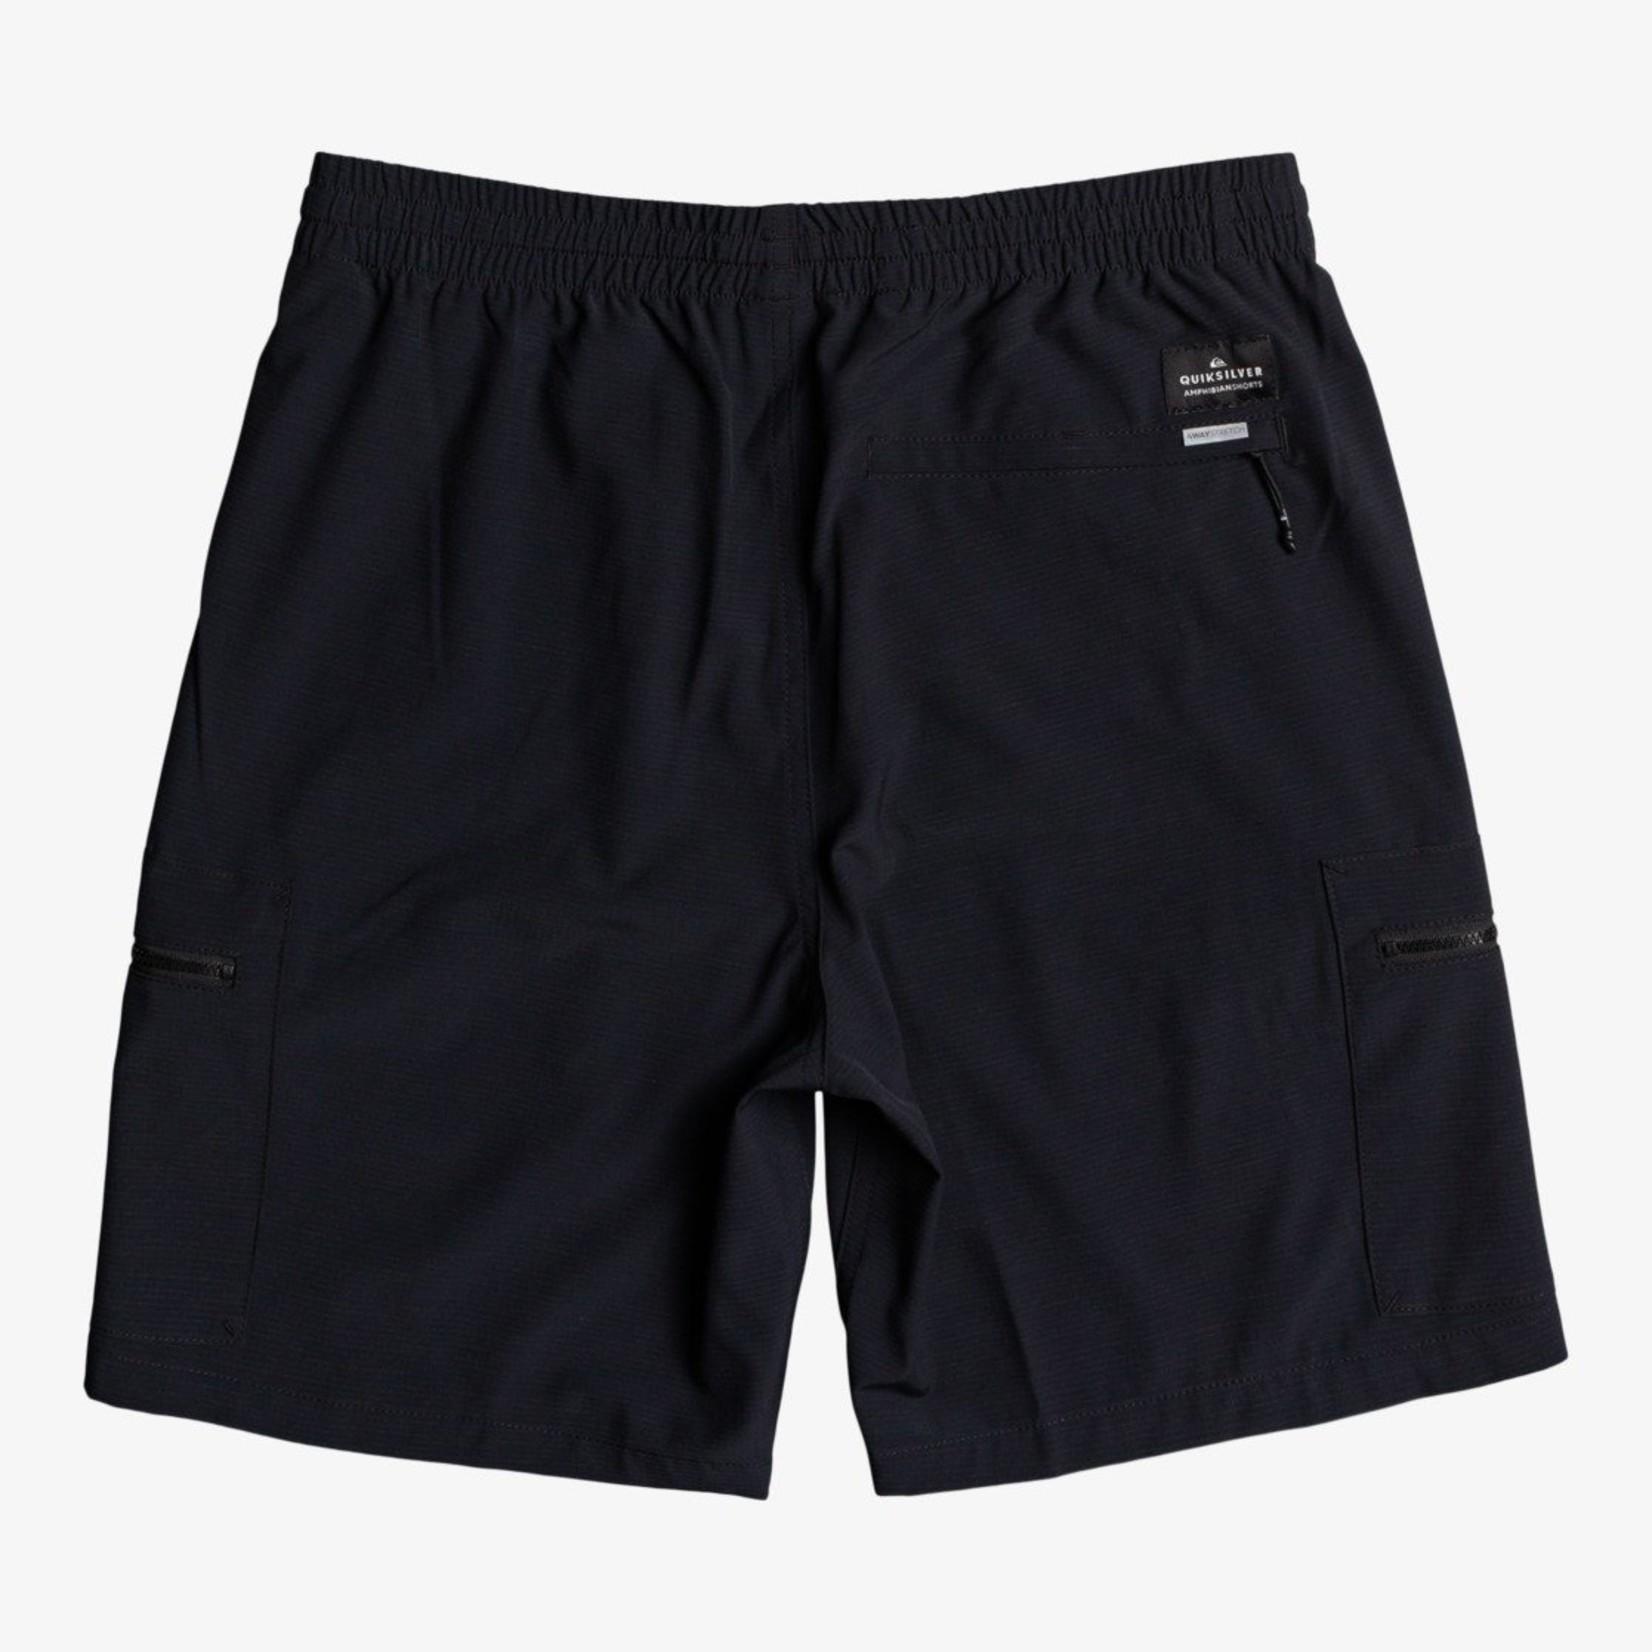 Quiksilver Quiksilver Elastic Cargo Amphibian Shorts